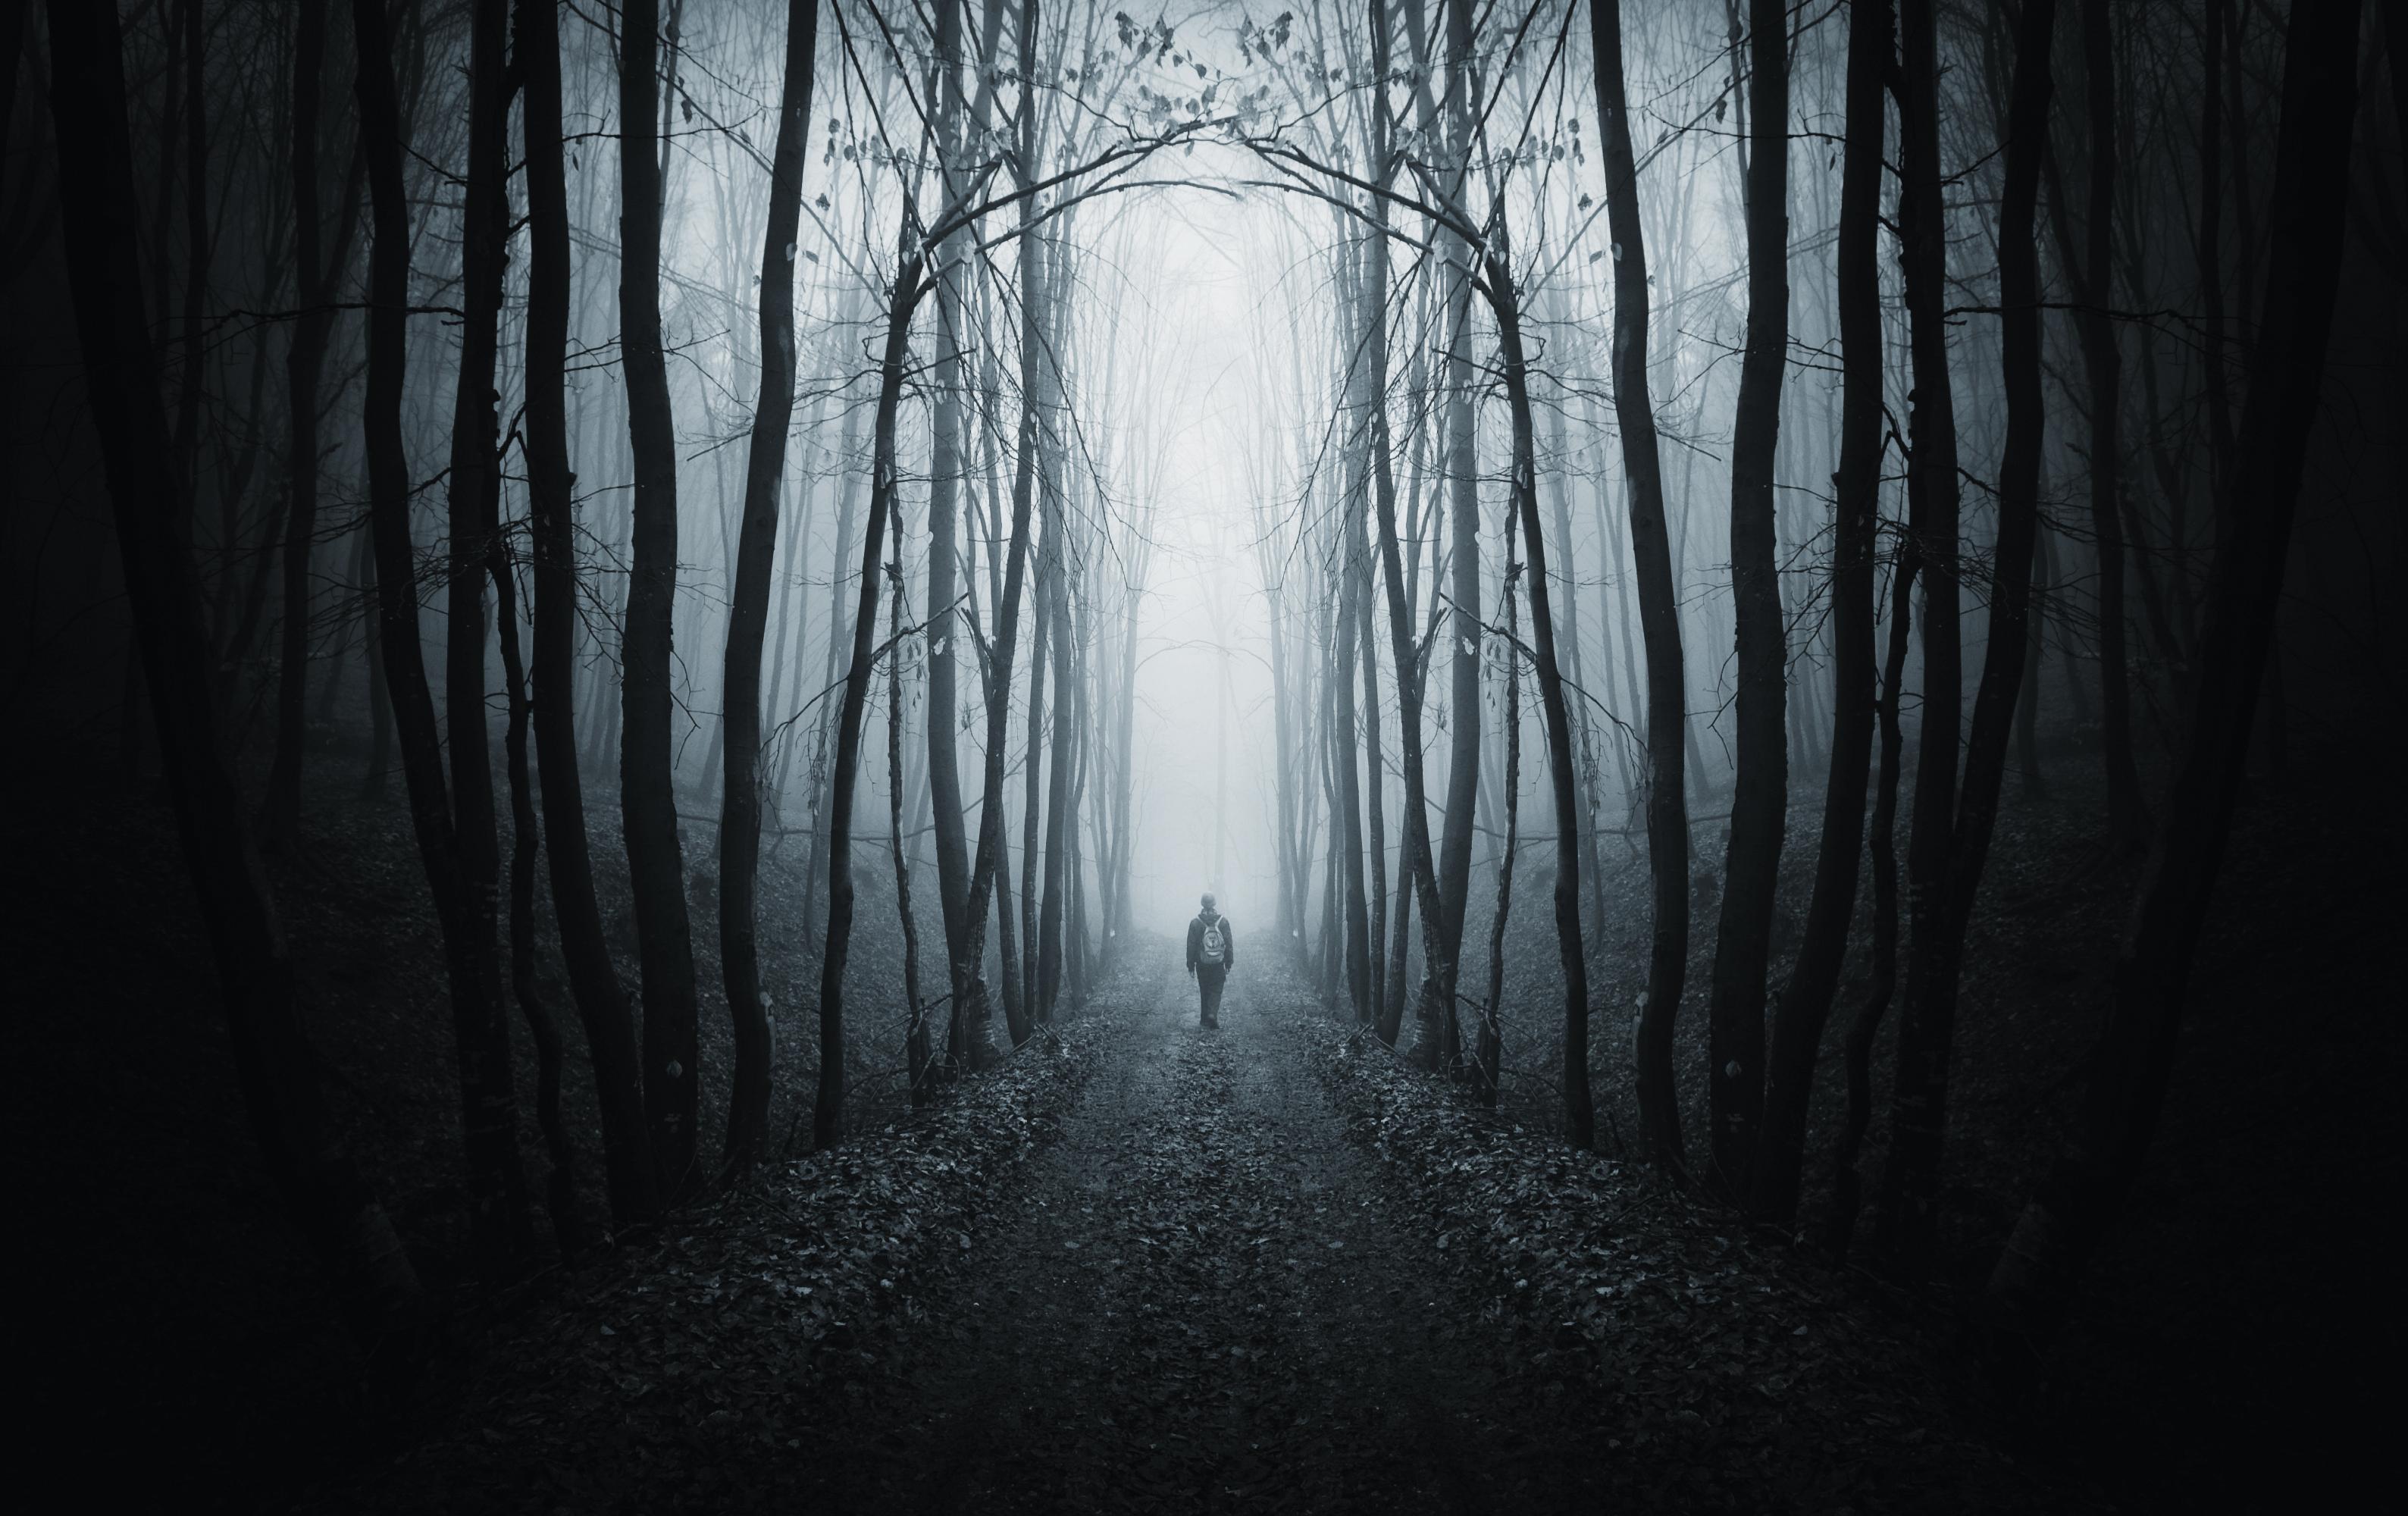 Boy forest